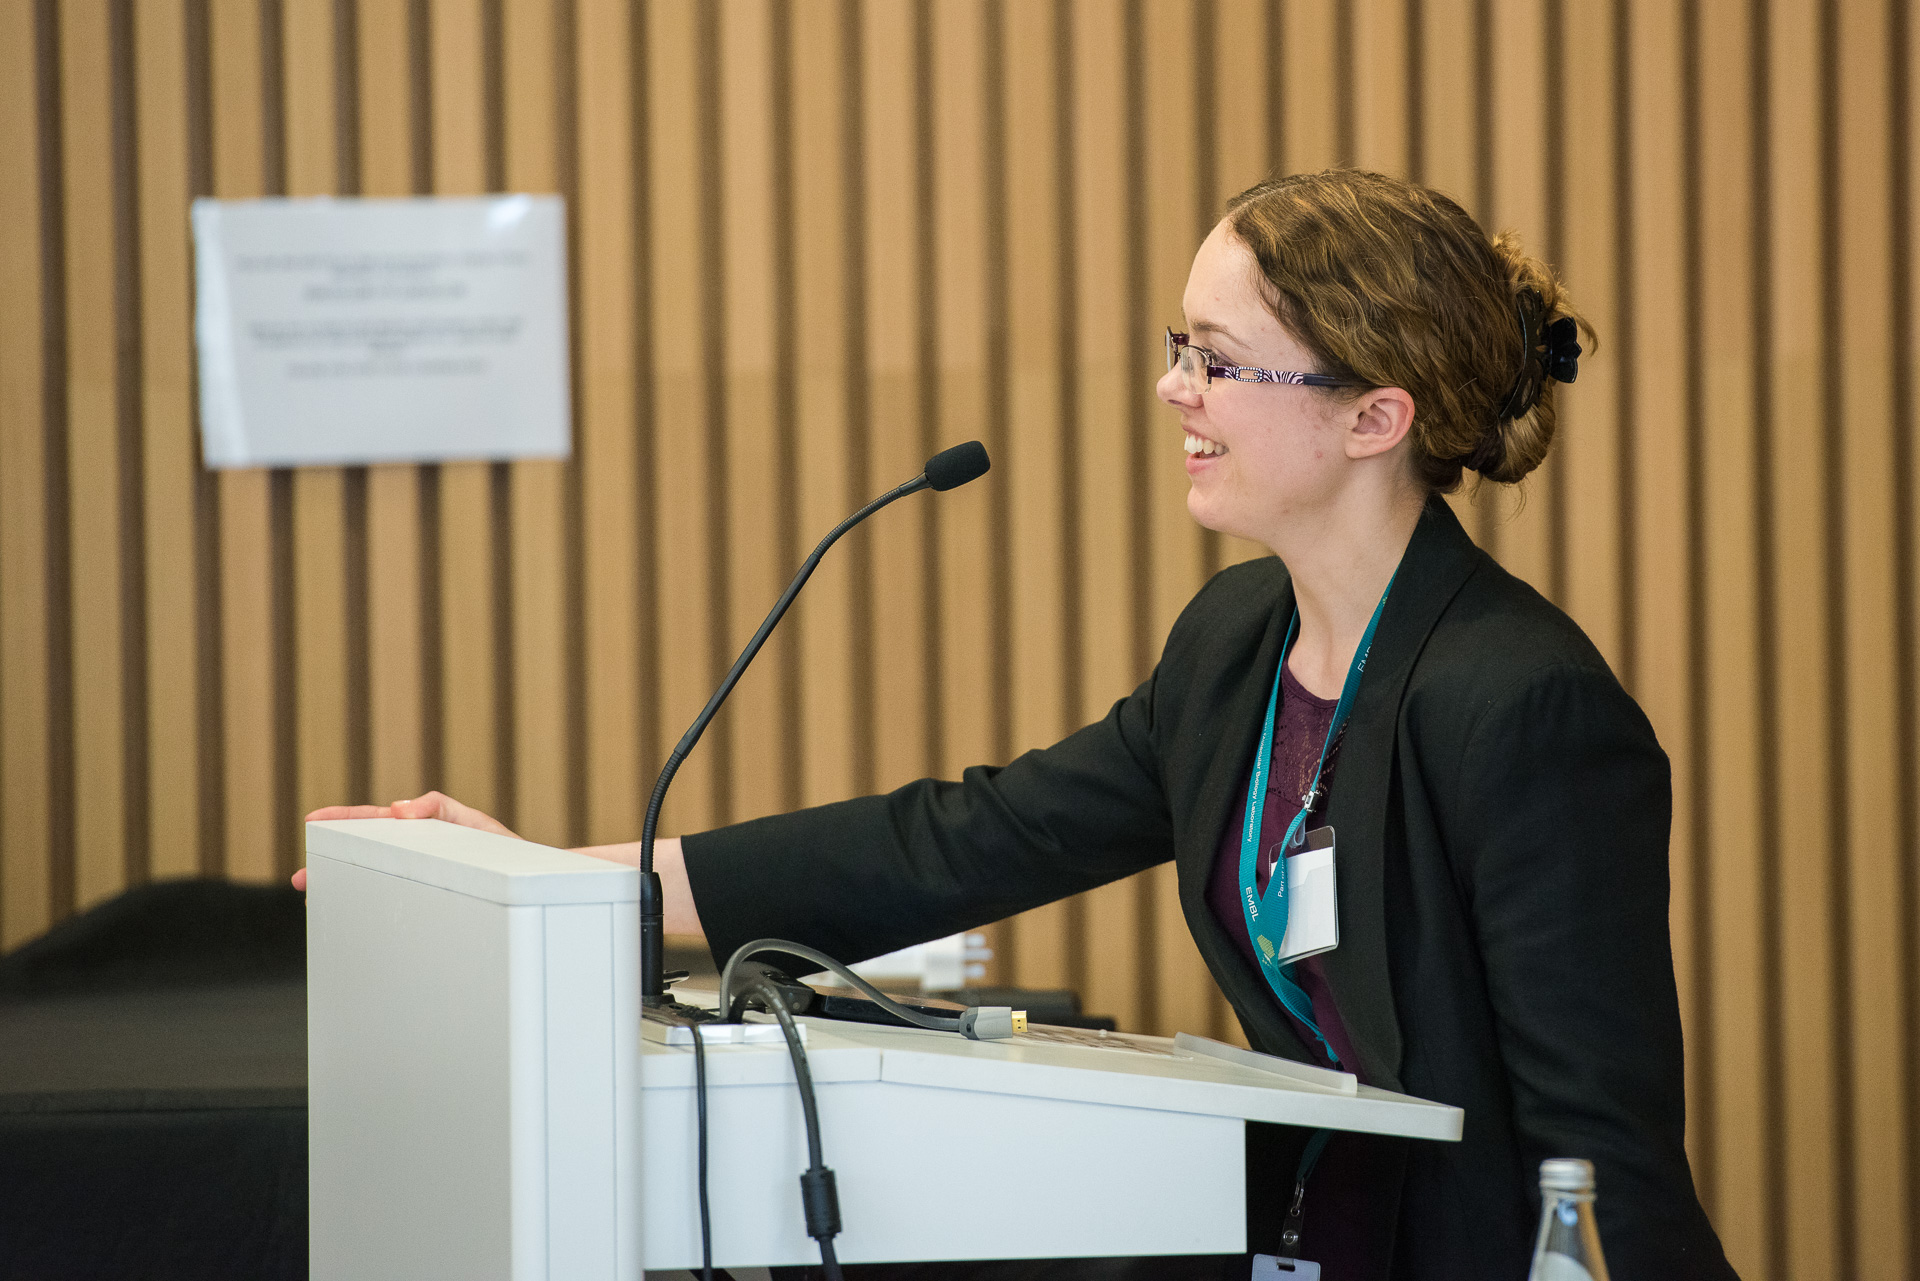 Katrina Pavelin, EMBL-EBI Open Day 2015